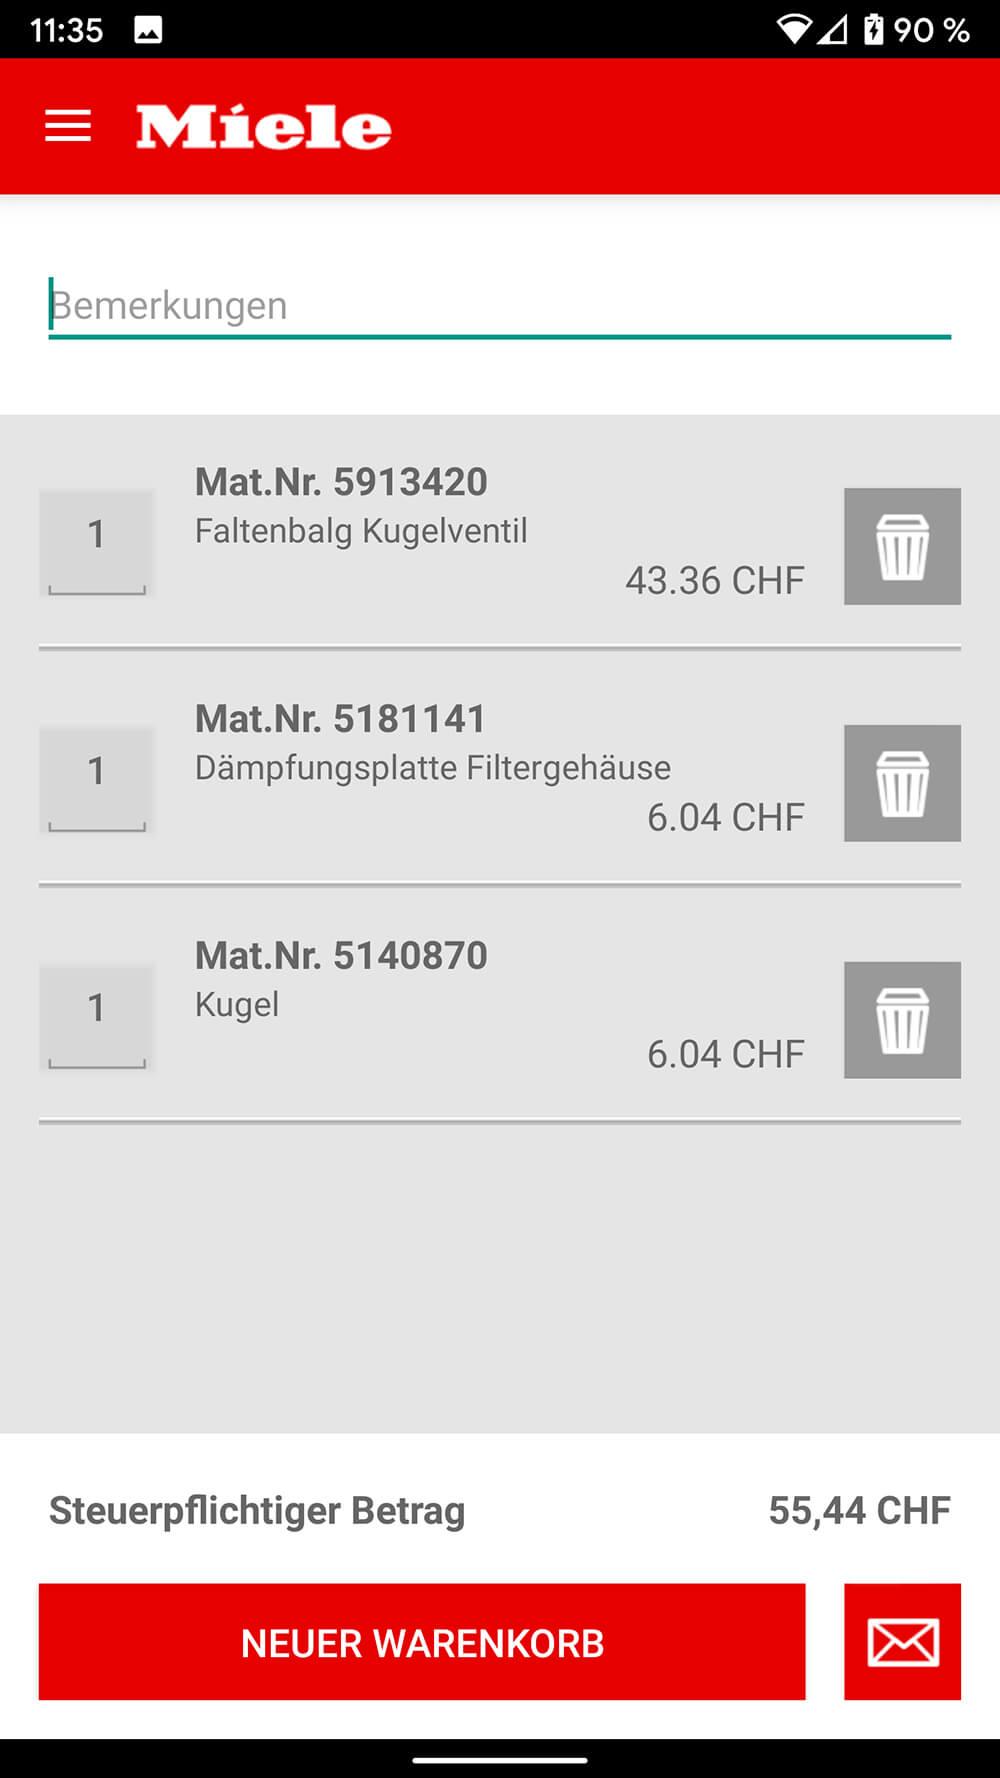 Screenshot Miele ETD-App, Auflistung Ersatzteile inklusive Preis